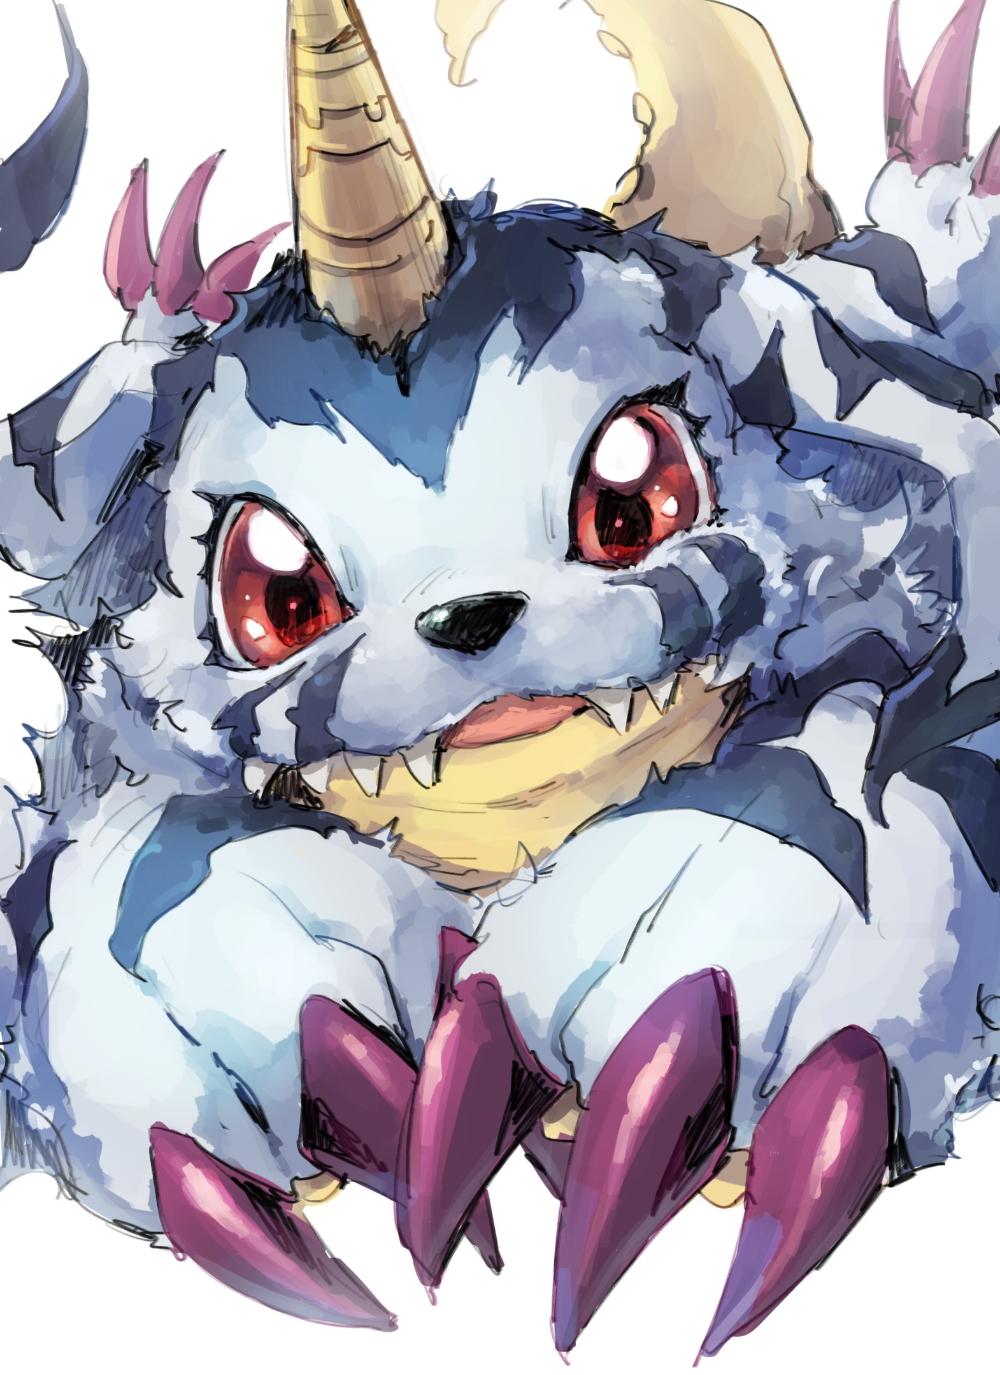 Ekaterina Tyurina Digimon Wallpaper Digimon Digital Monsters Digimon